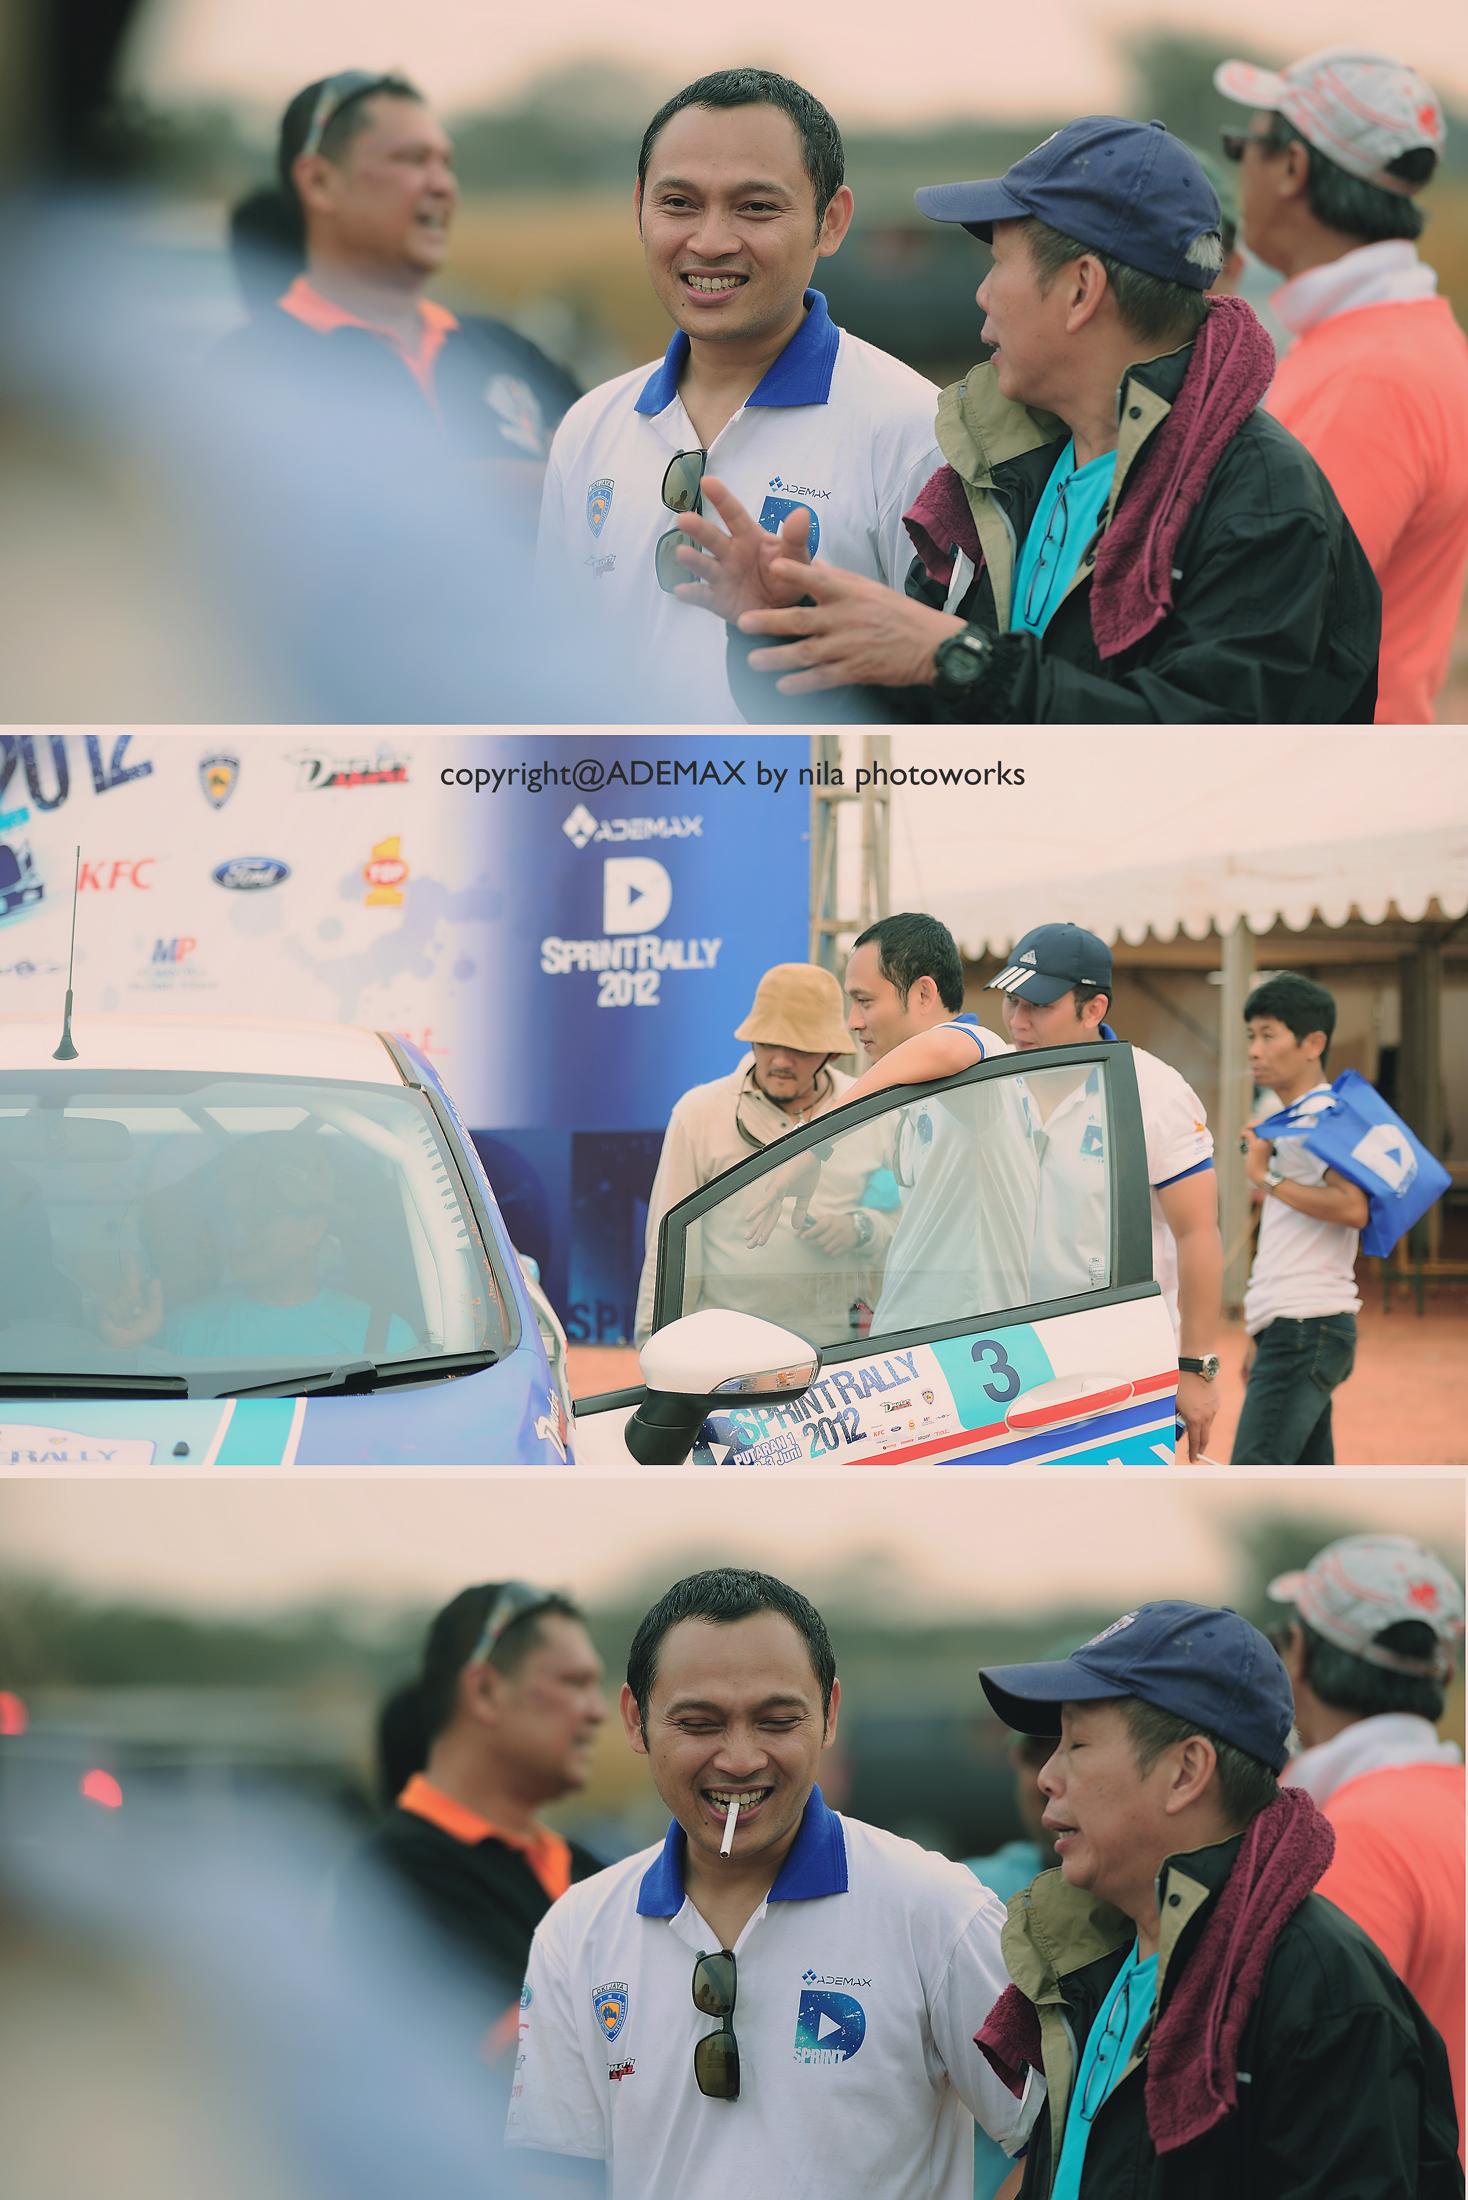 rally_ademax33_fb.jpg